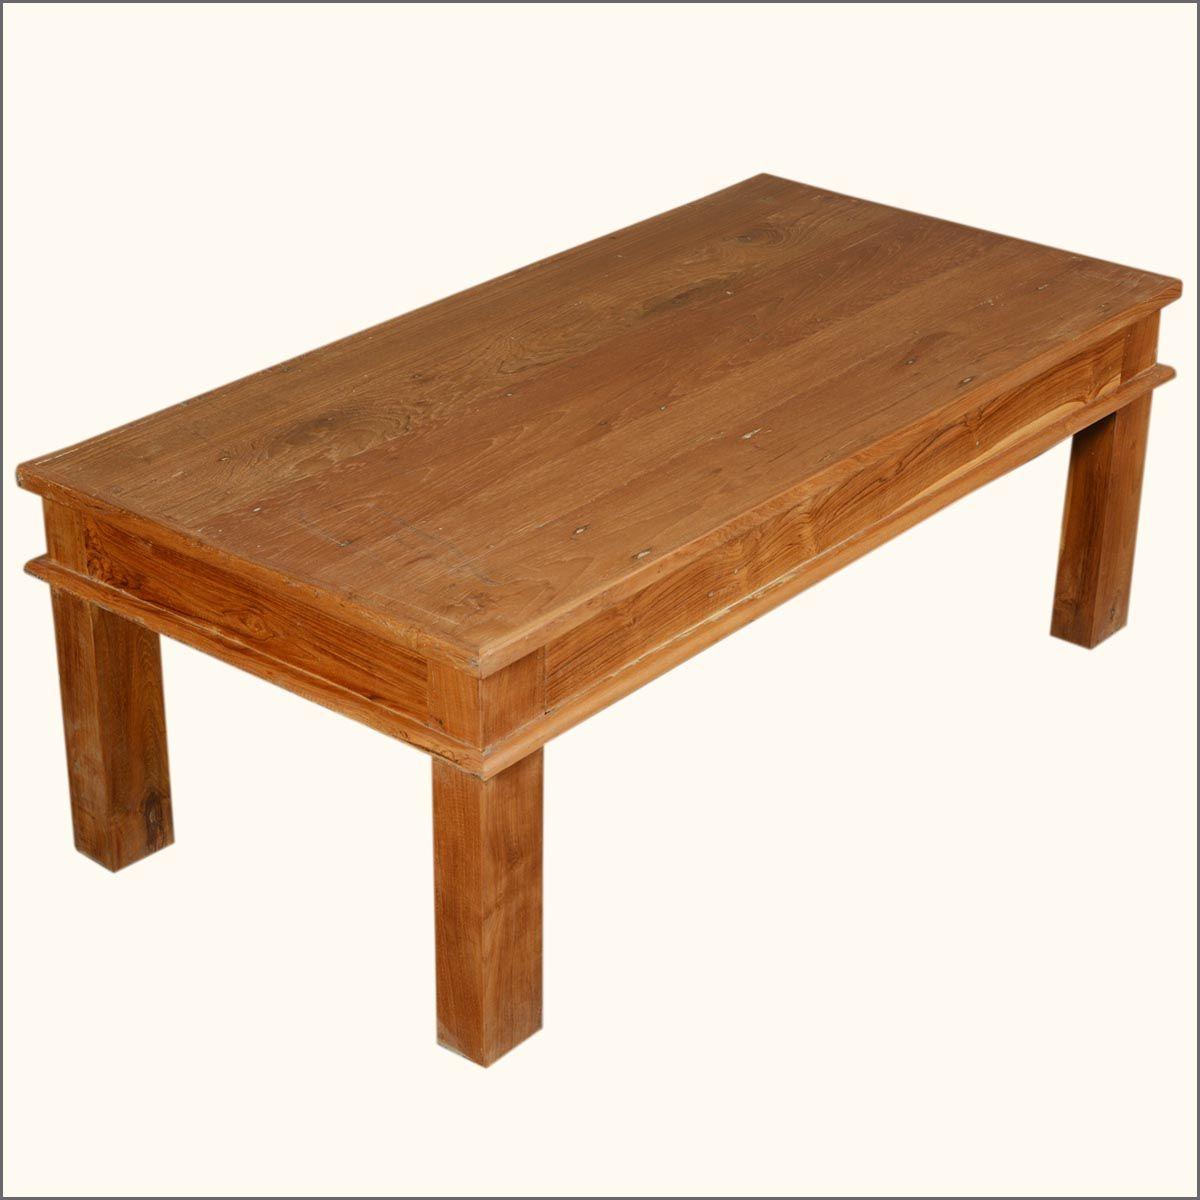 48 Solid Teak Wood Danish Rustic Coffee Table Rustic Coffee Tables Coffee Table Teak Wood [ 1200 x 1200 Pixel ]